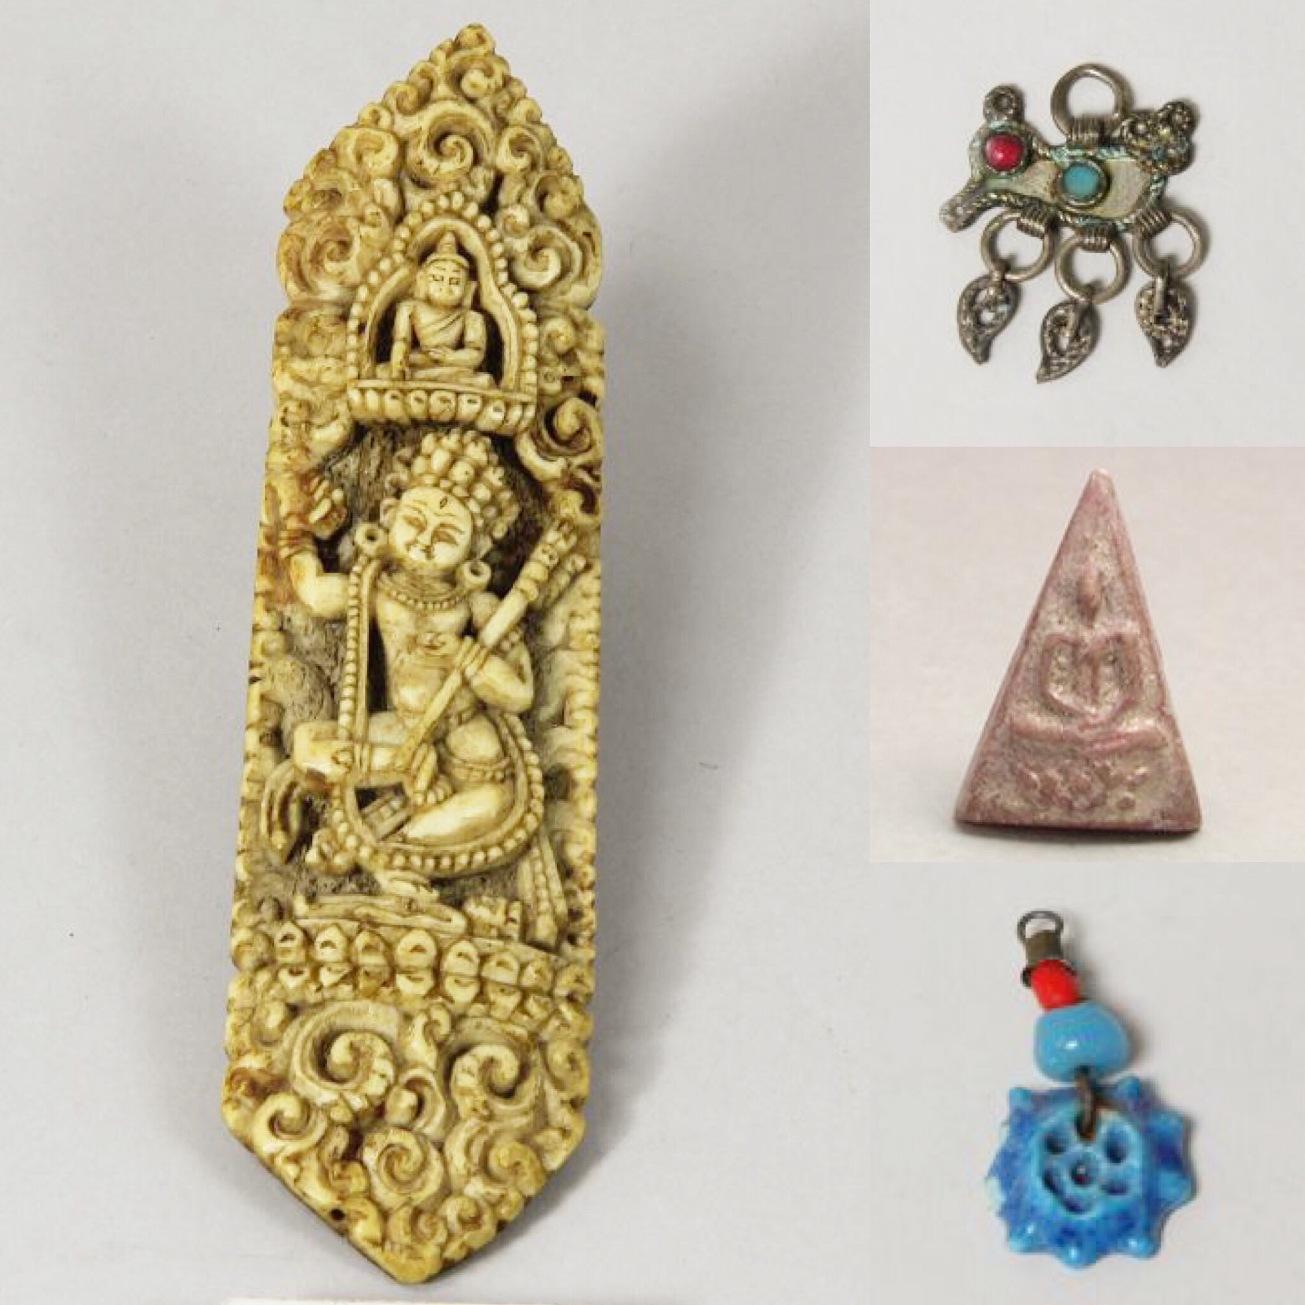 new year, amulets, luck, jewllery, adornment, celebration, superstition, magic